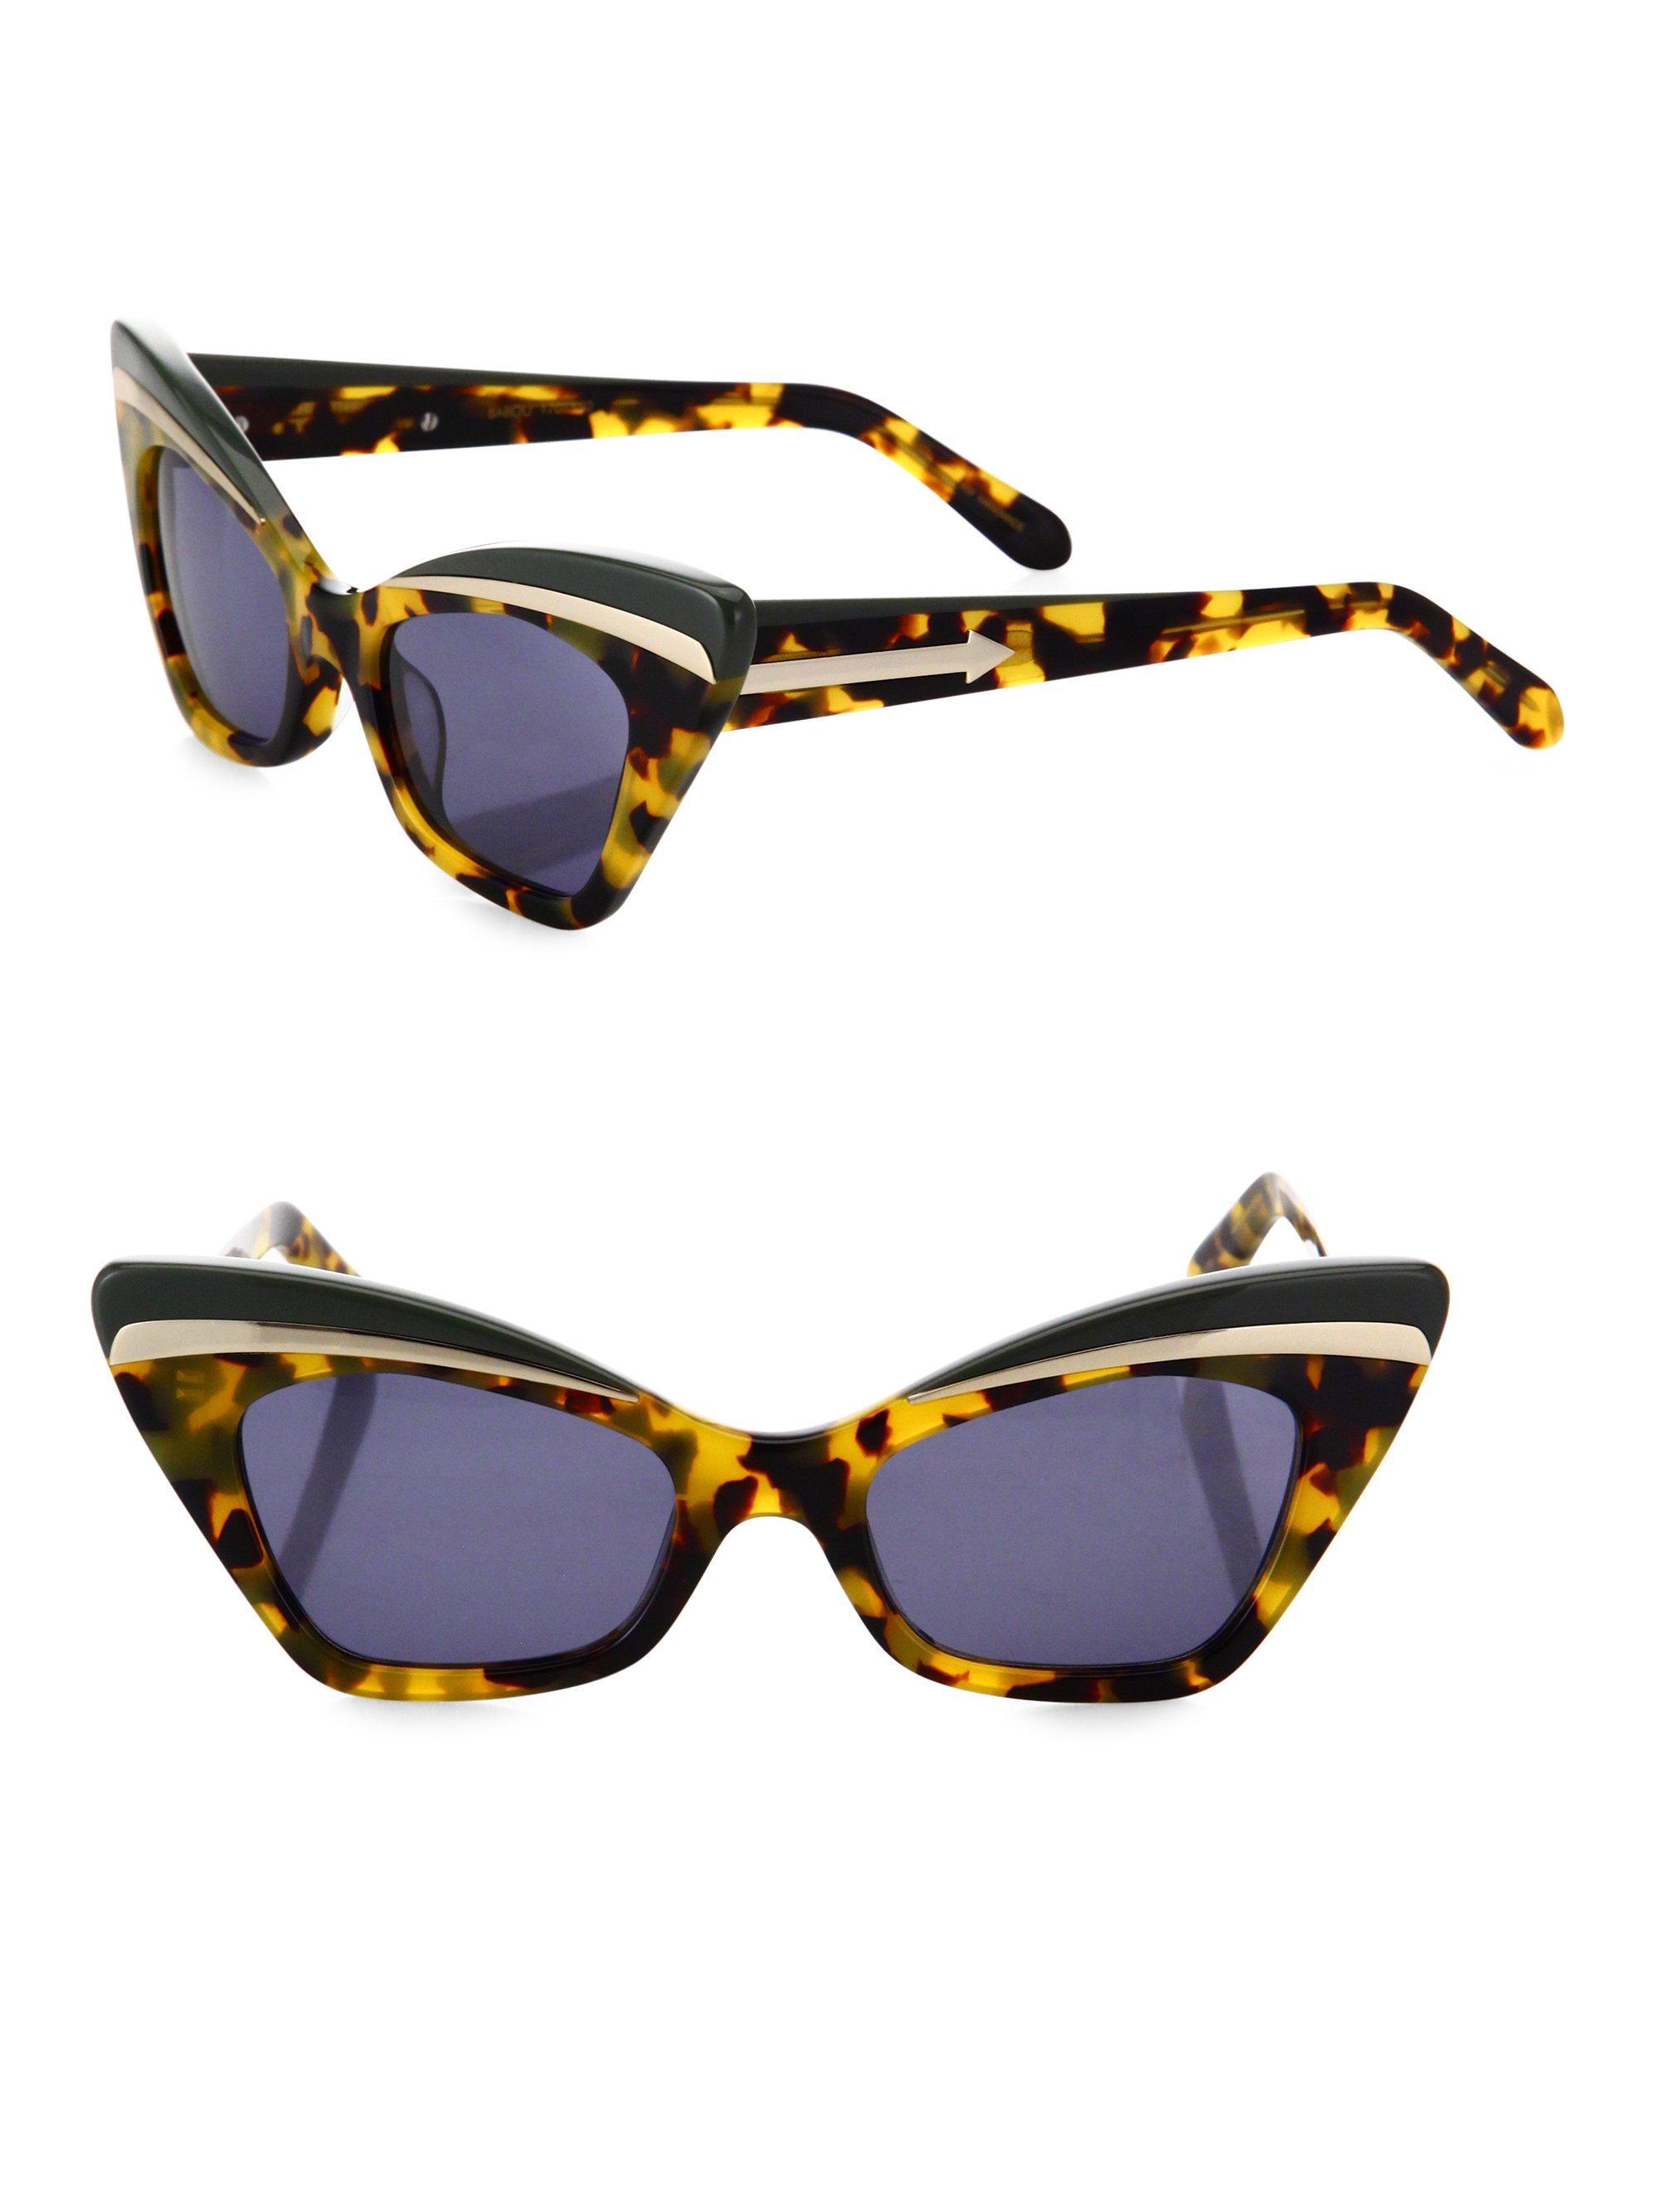 Trópicos Agravio Loco Gafas De Sol De Ojos De Gato Karen Walker Gafas wqzC4BfUIz